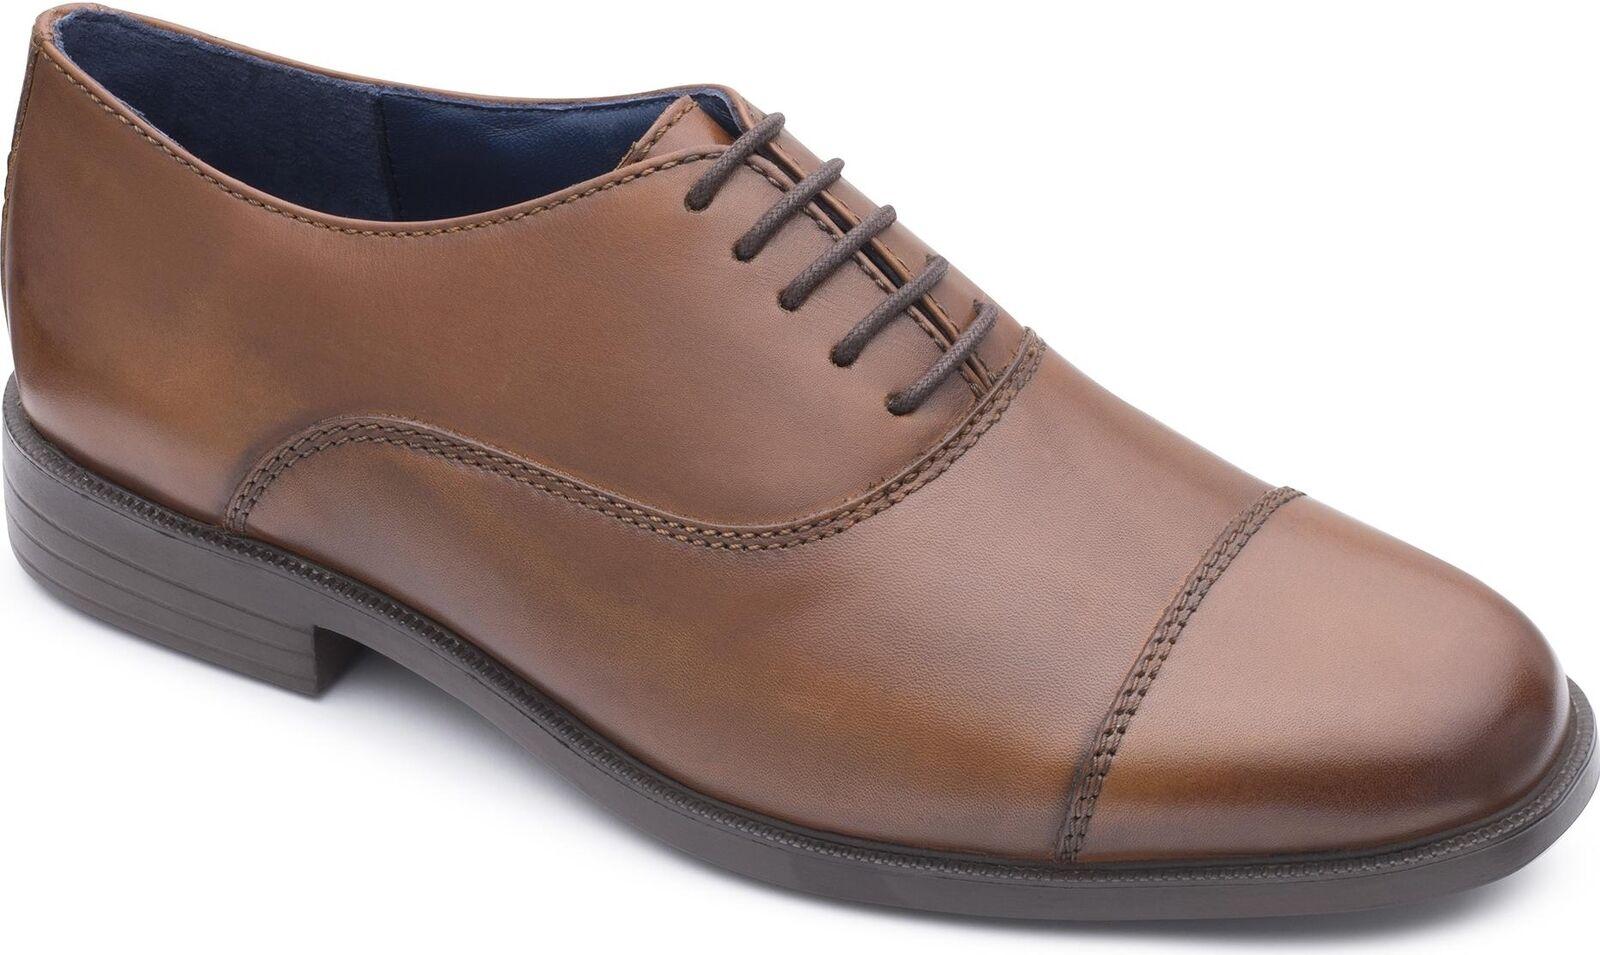 Padders KENSINGTON Mens Leather Wide (G Fit) Oxford Toe Cap Formal schuhe Tan